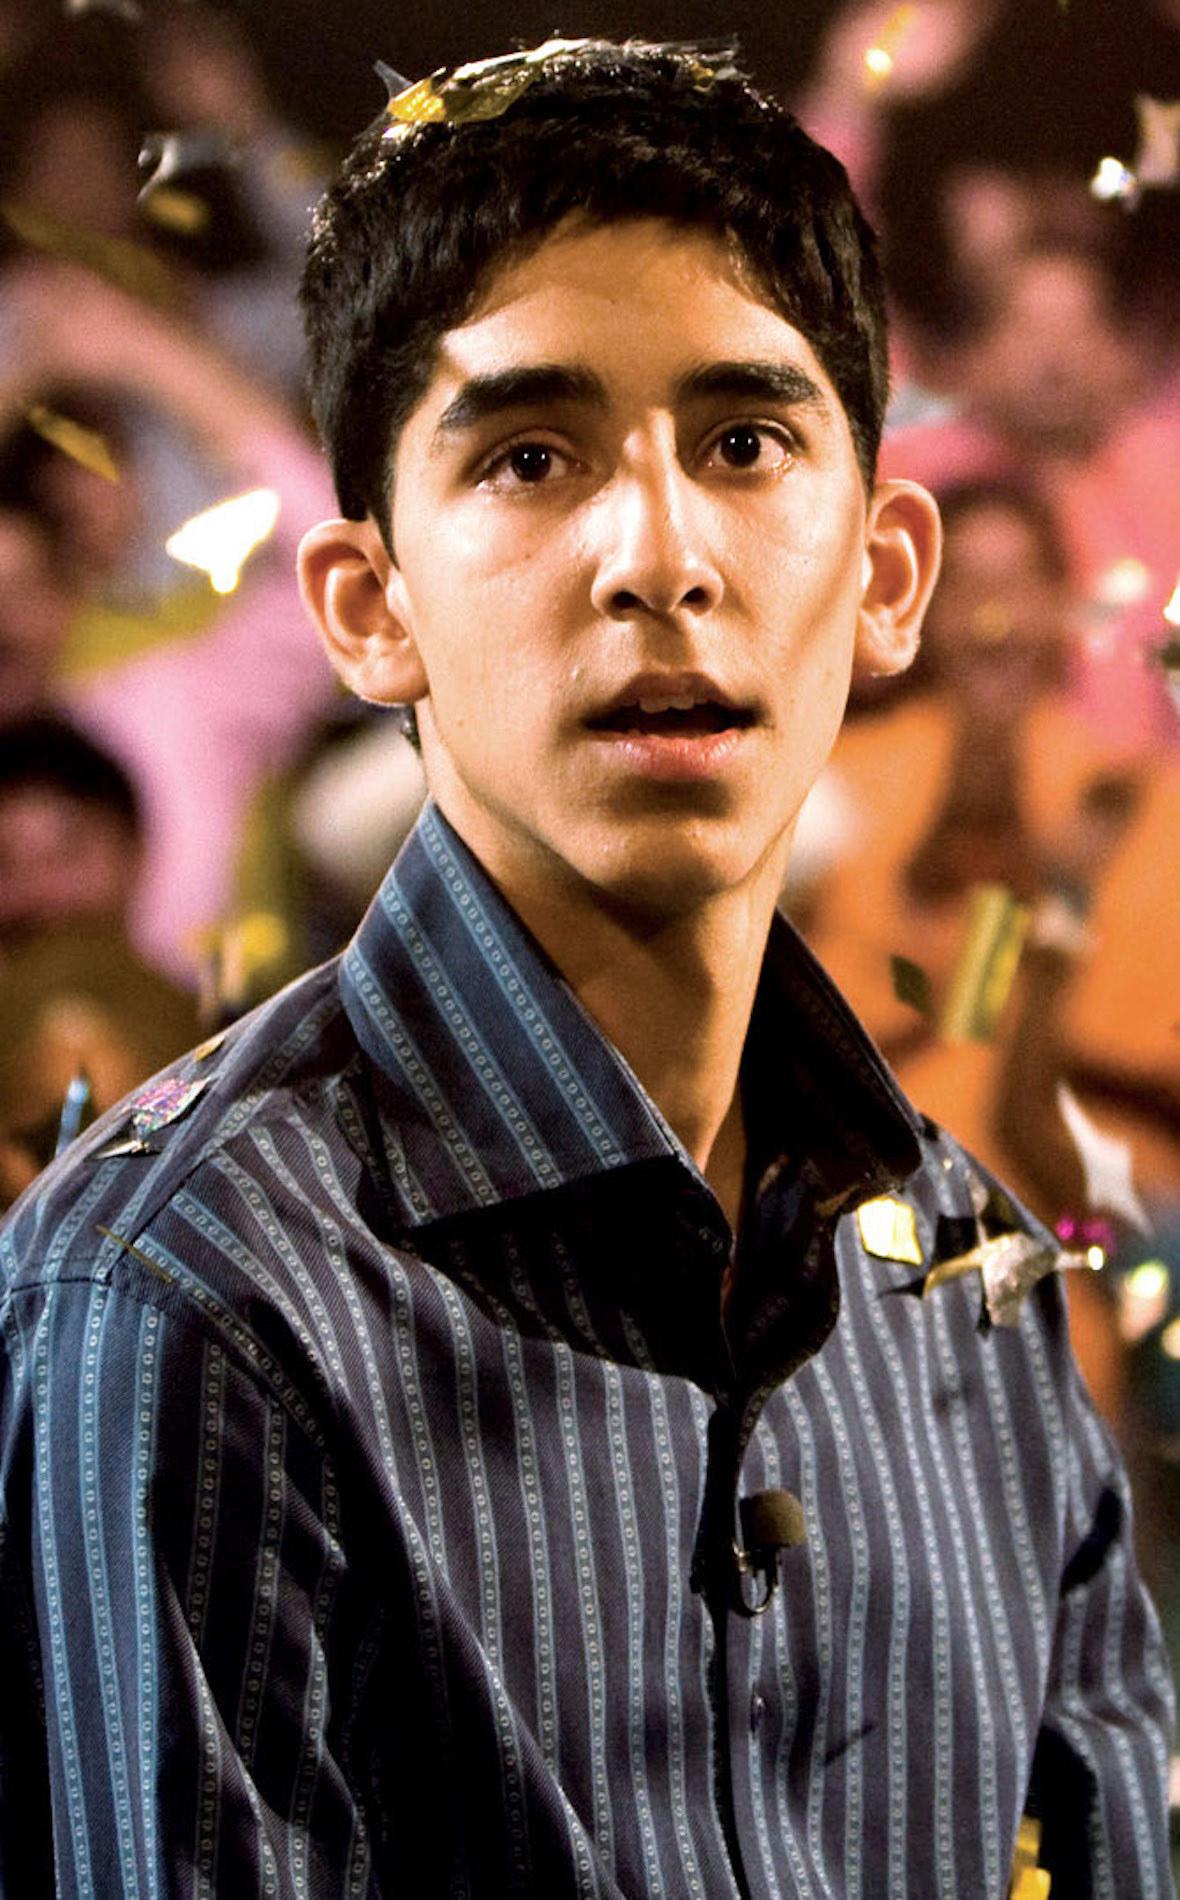 Dev Patel making a surprised face while confetti falls all around him